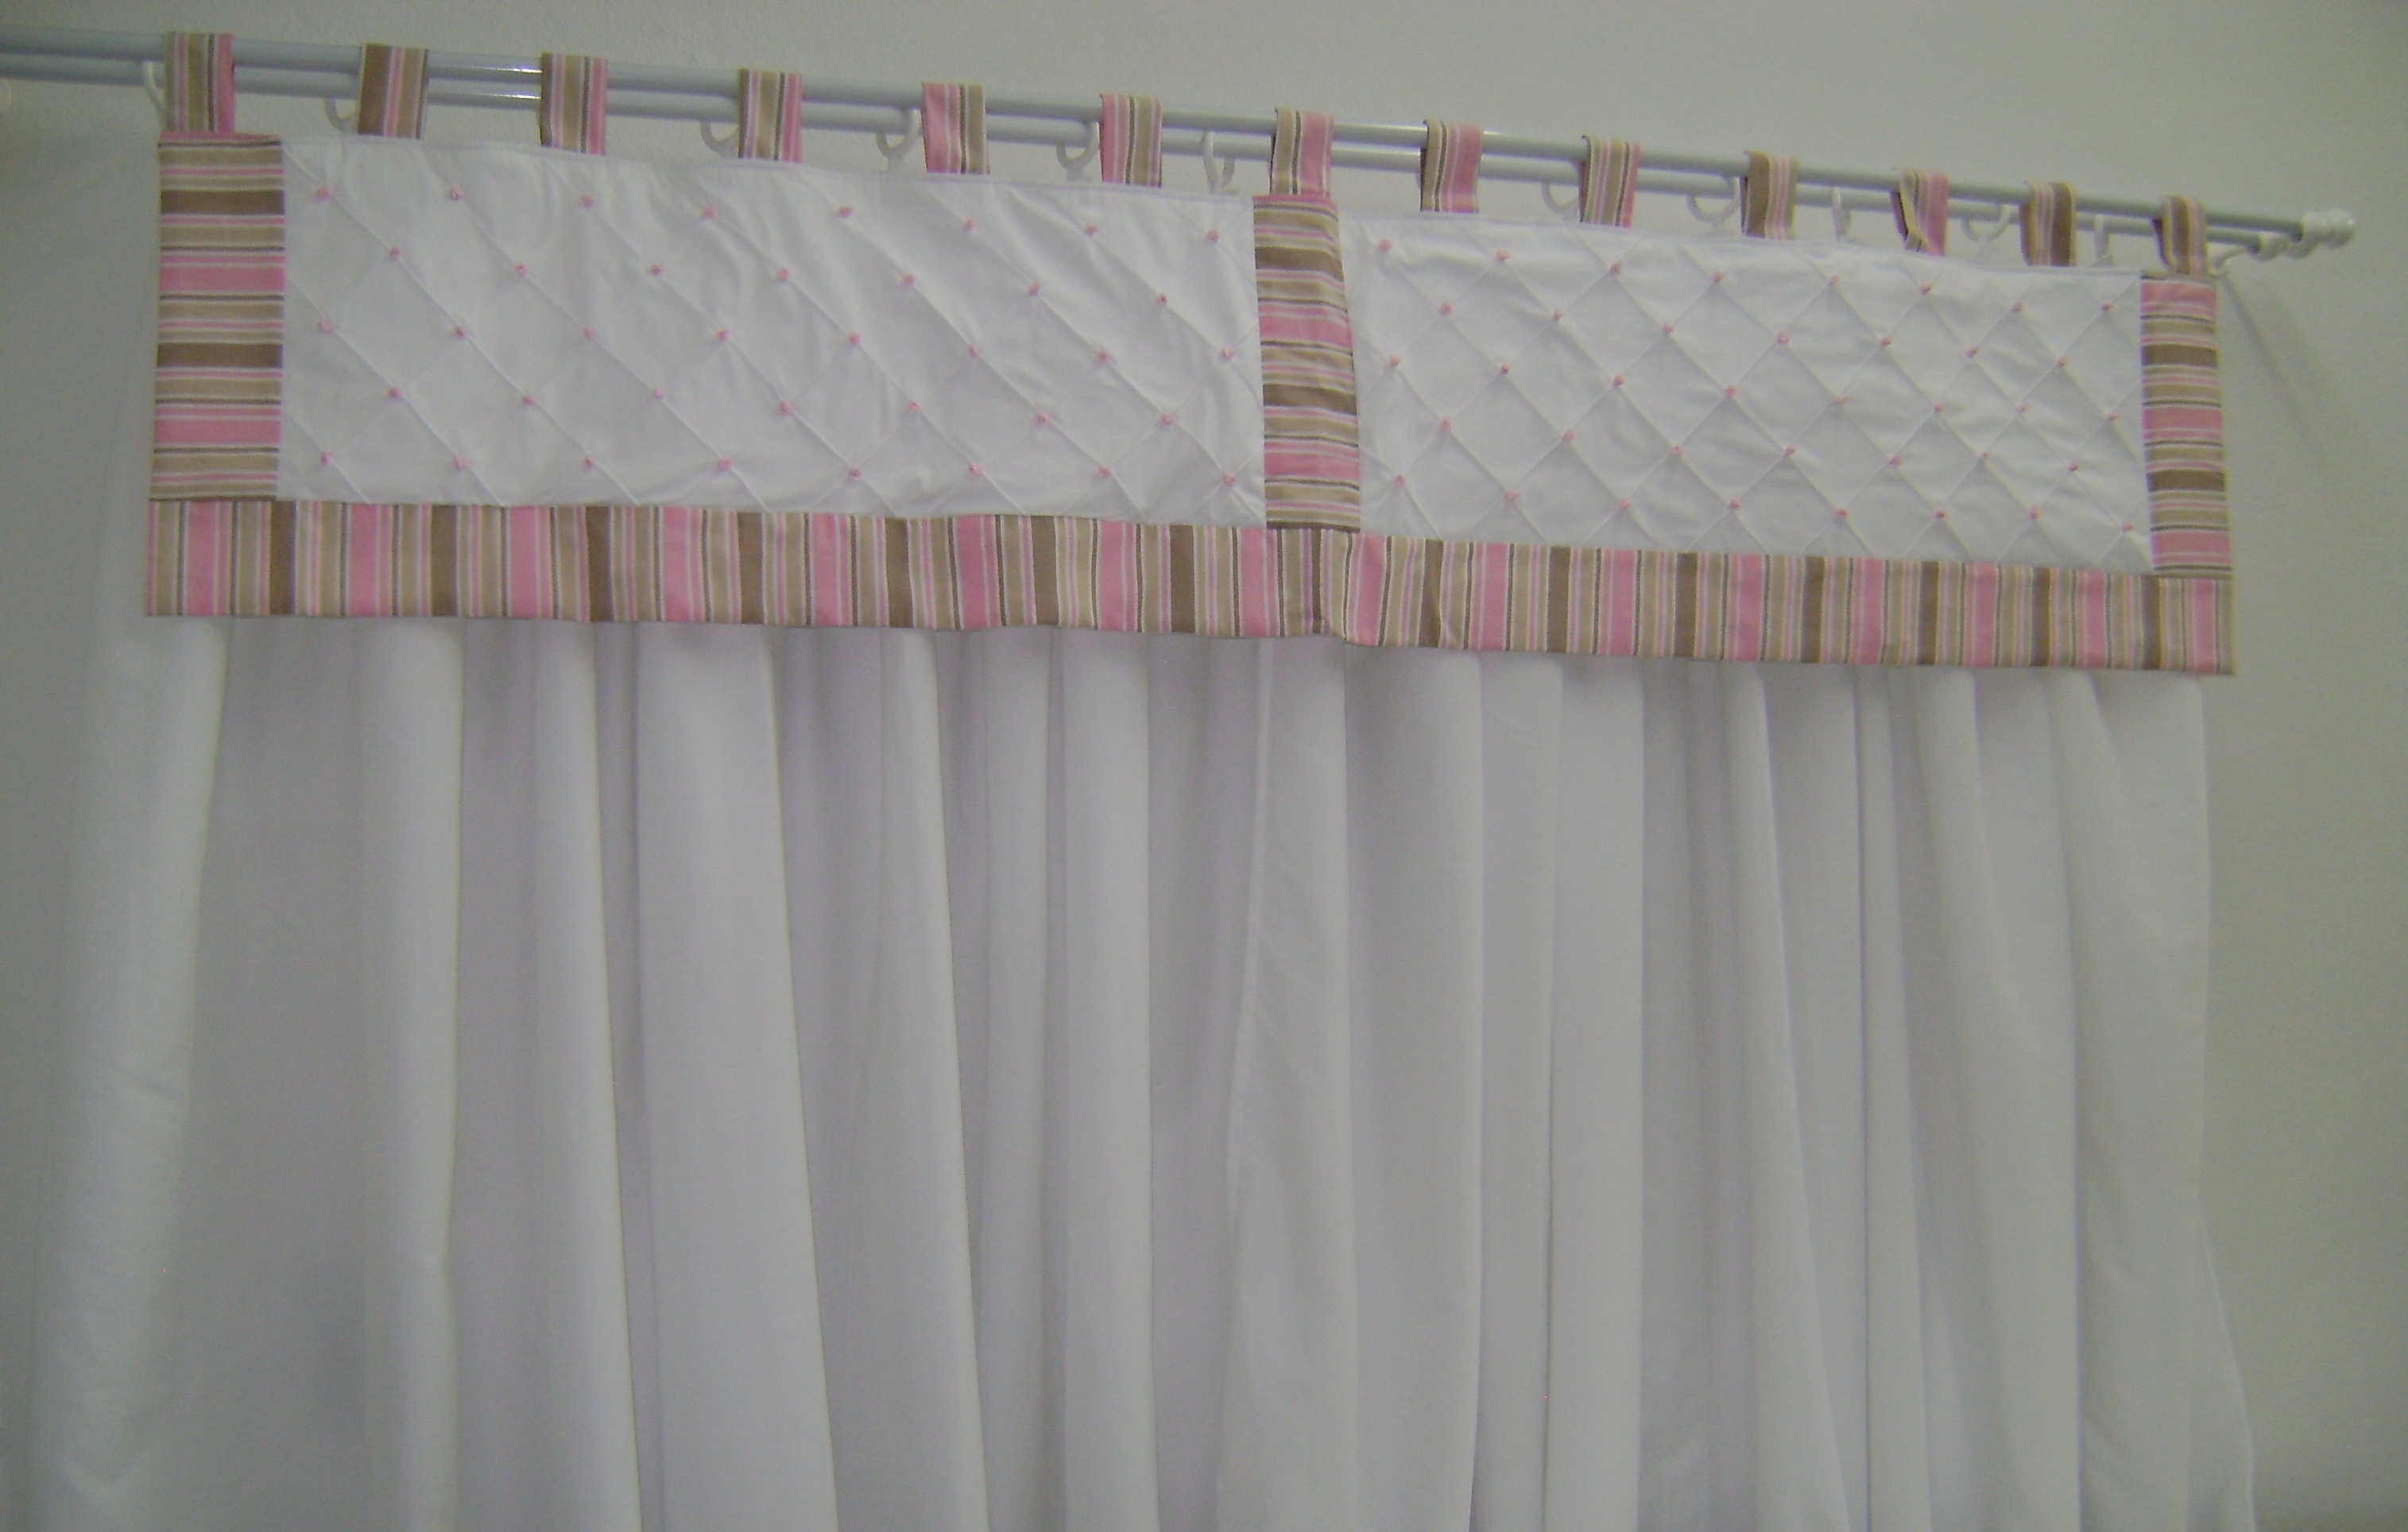 20170405195518 cortina marrom para quarto de bebe - Cortina para bebe ...